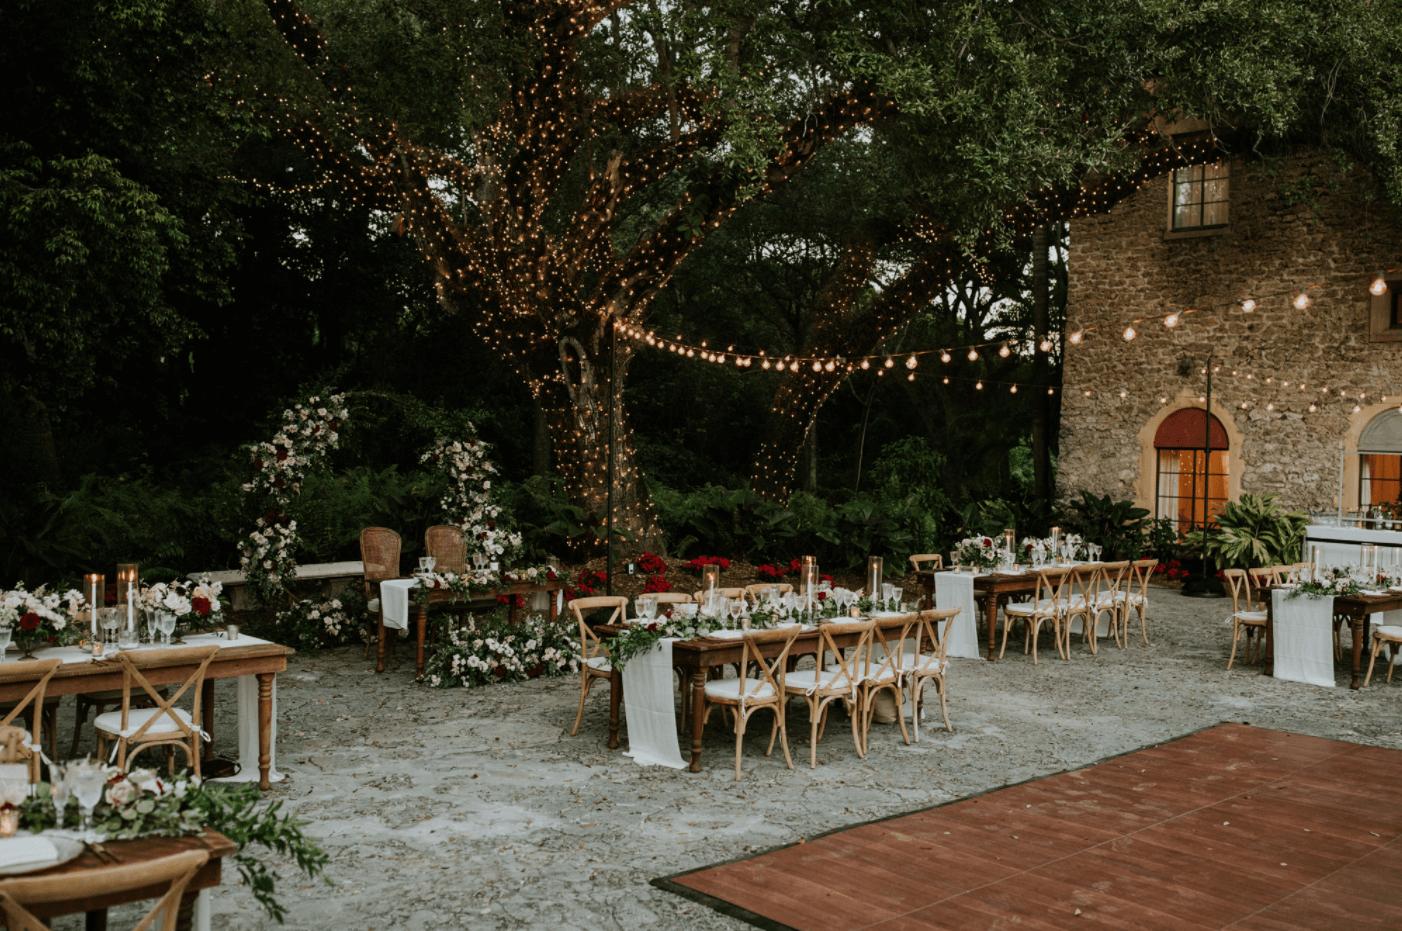 outdoor wedding in the garden in miami